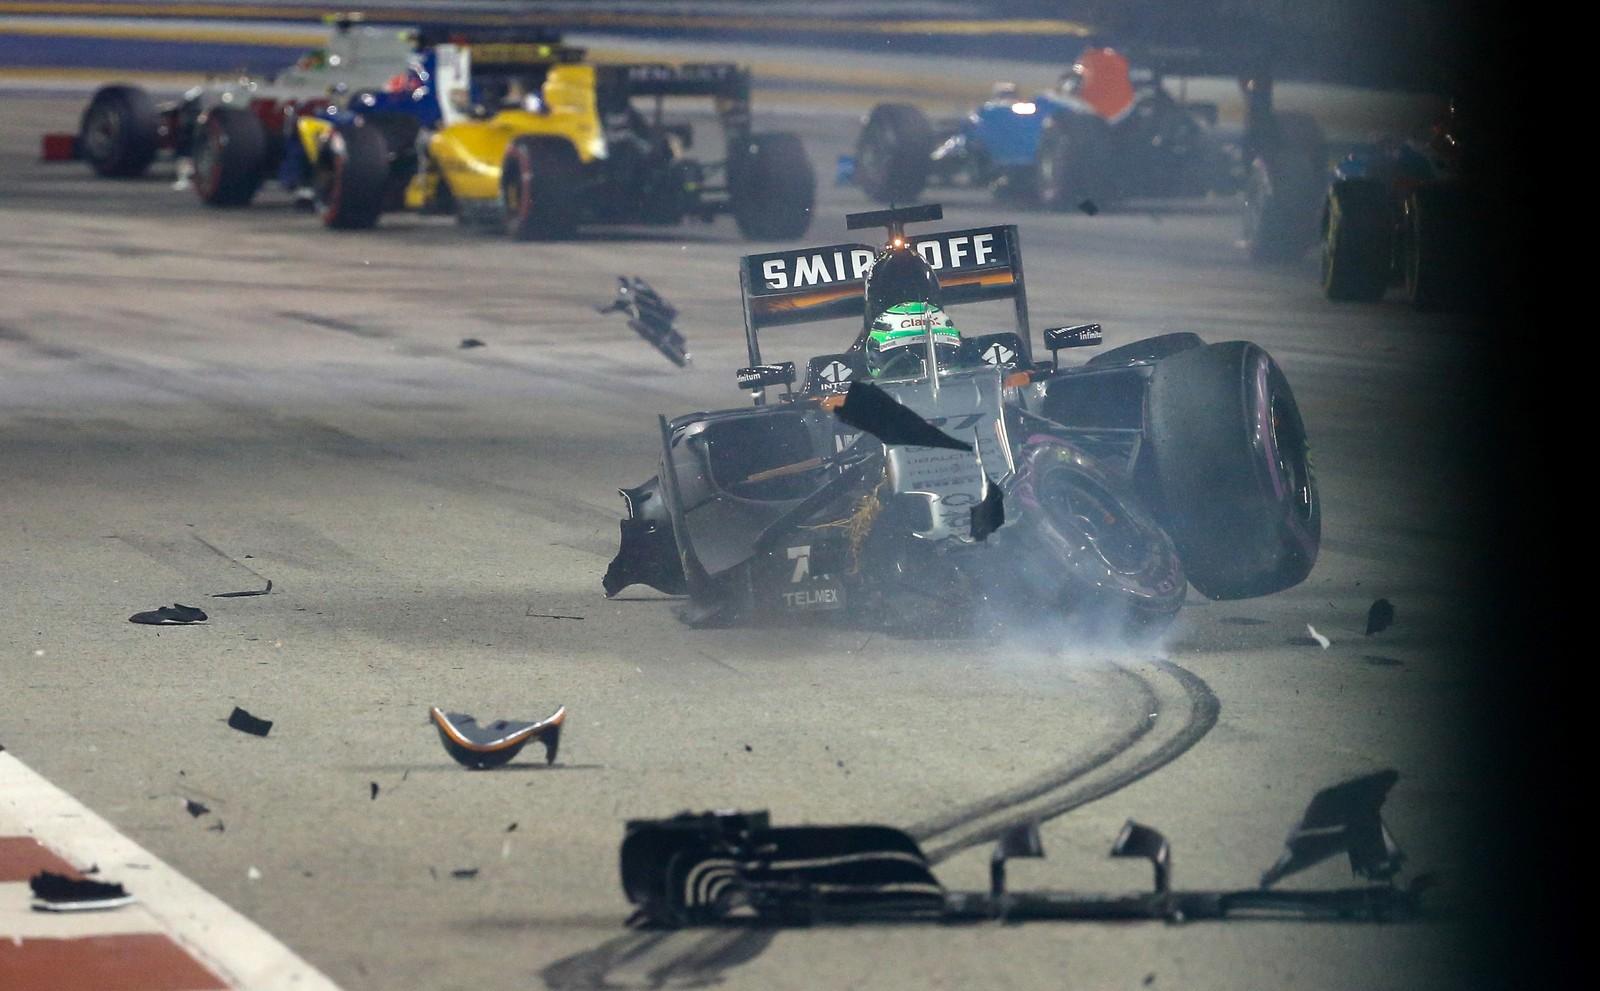 Nico Hulkenberg er uheldig og krasjer under et Formel 1-løp under Singapore Grand Prix.